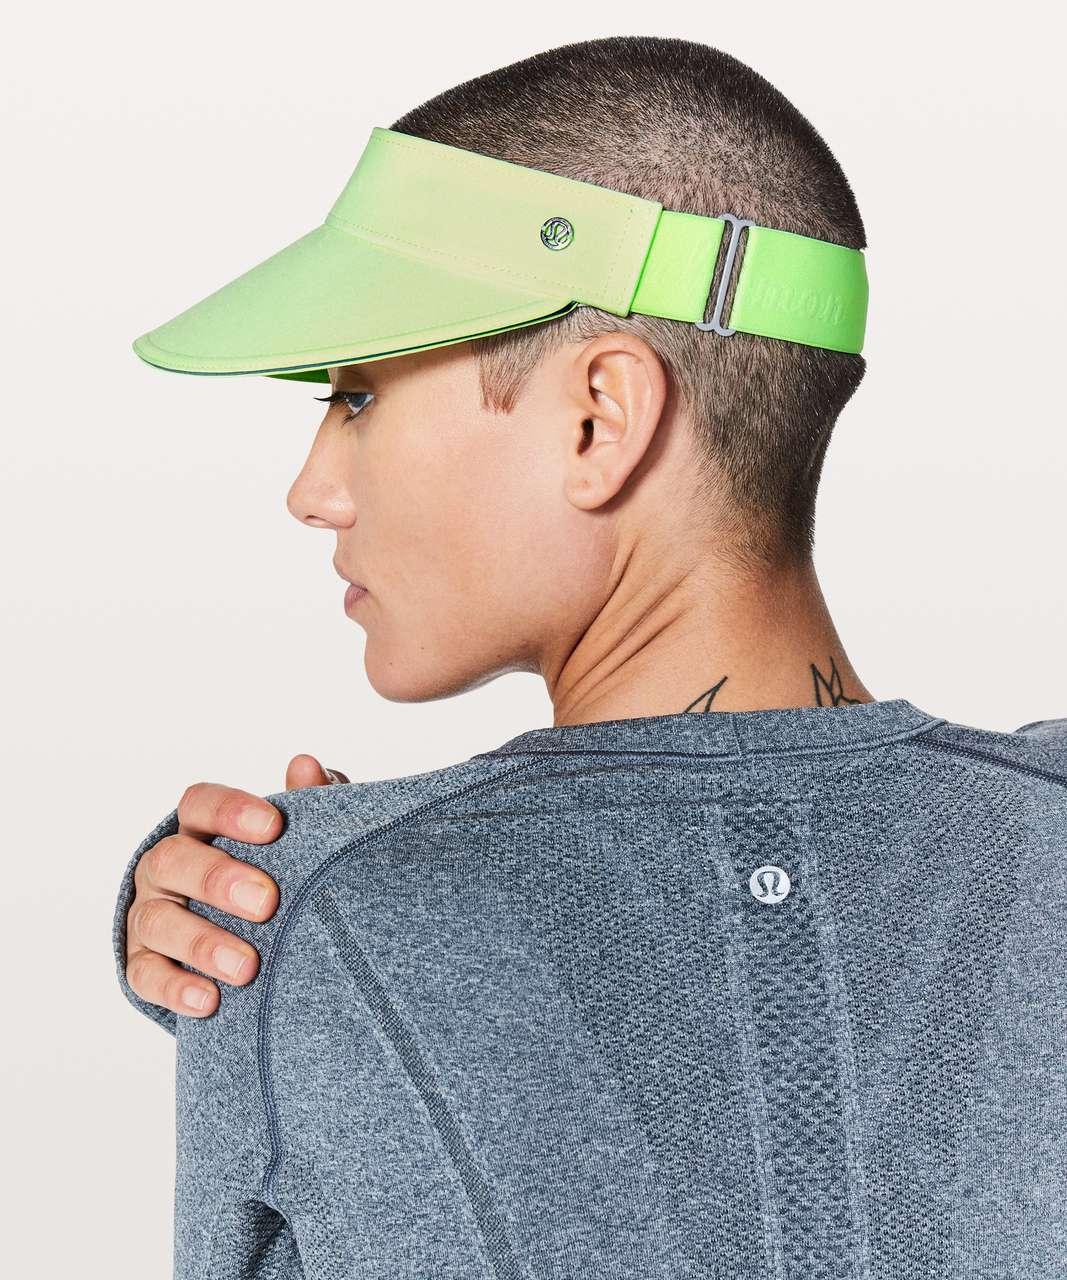 Lululemon Fast Paced Run Visor - Fluro Citrus / Clear Mint